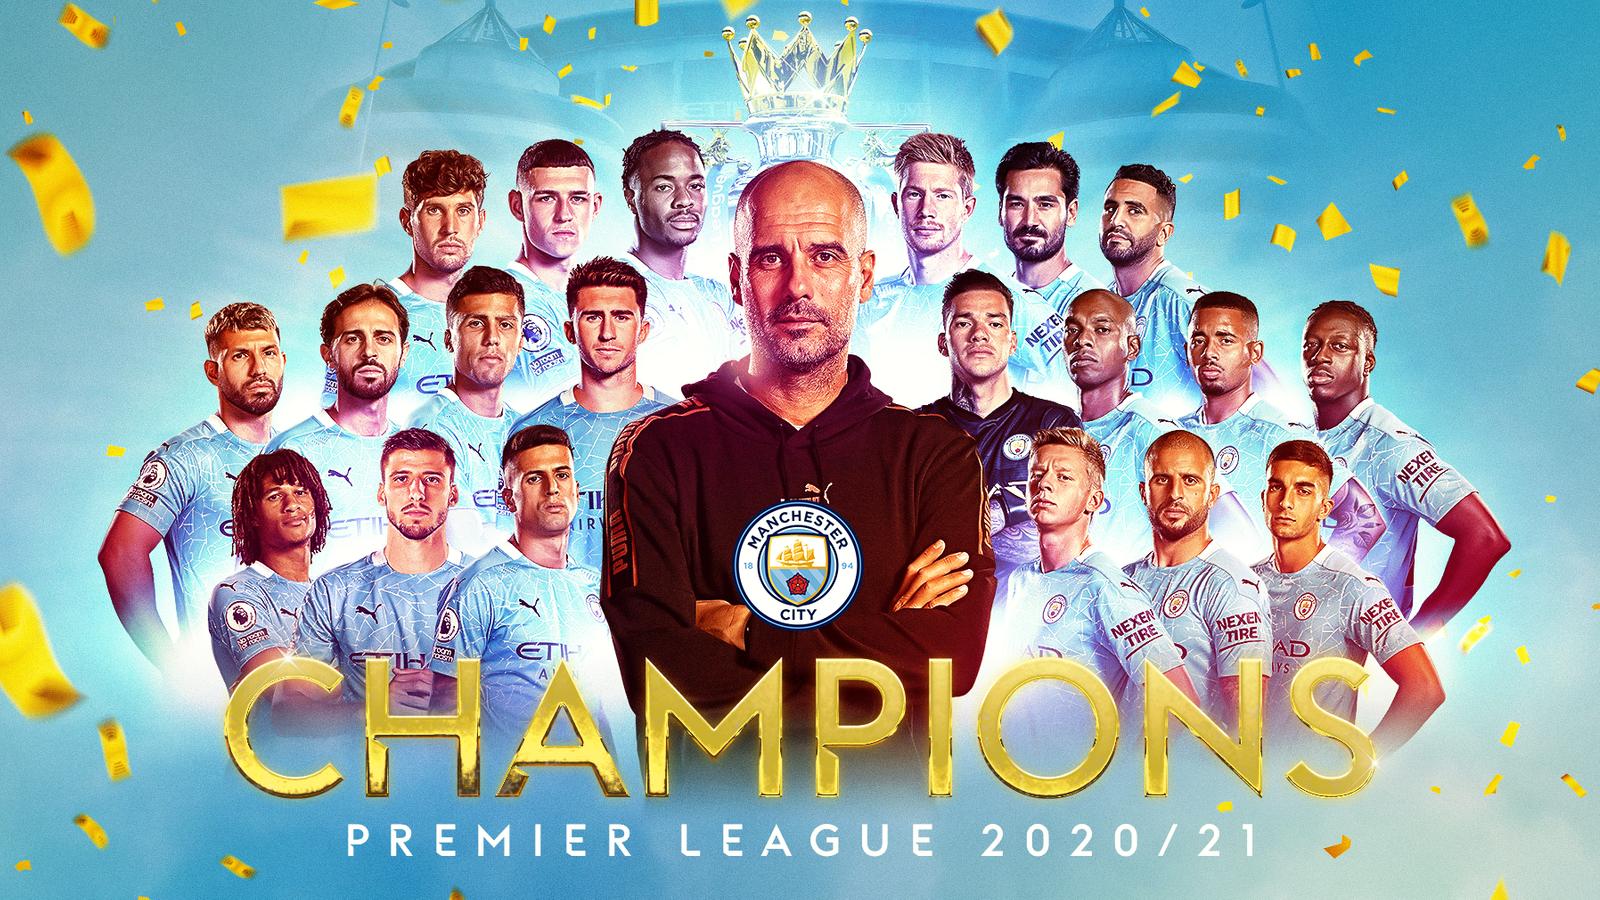 Manchester City crowned 2020-21 Premier League champions   மான்செஸ்டர் சிட்டி 2020-21 பிரீமியர் லீக் சாம்பியனாக முடிசூடியது.  _40.1